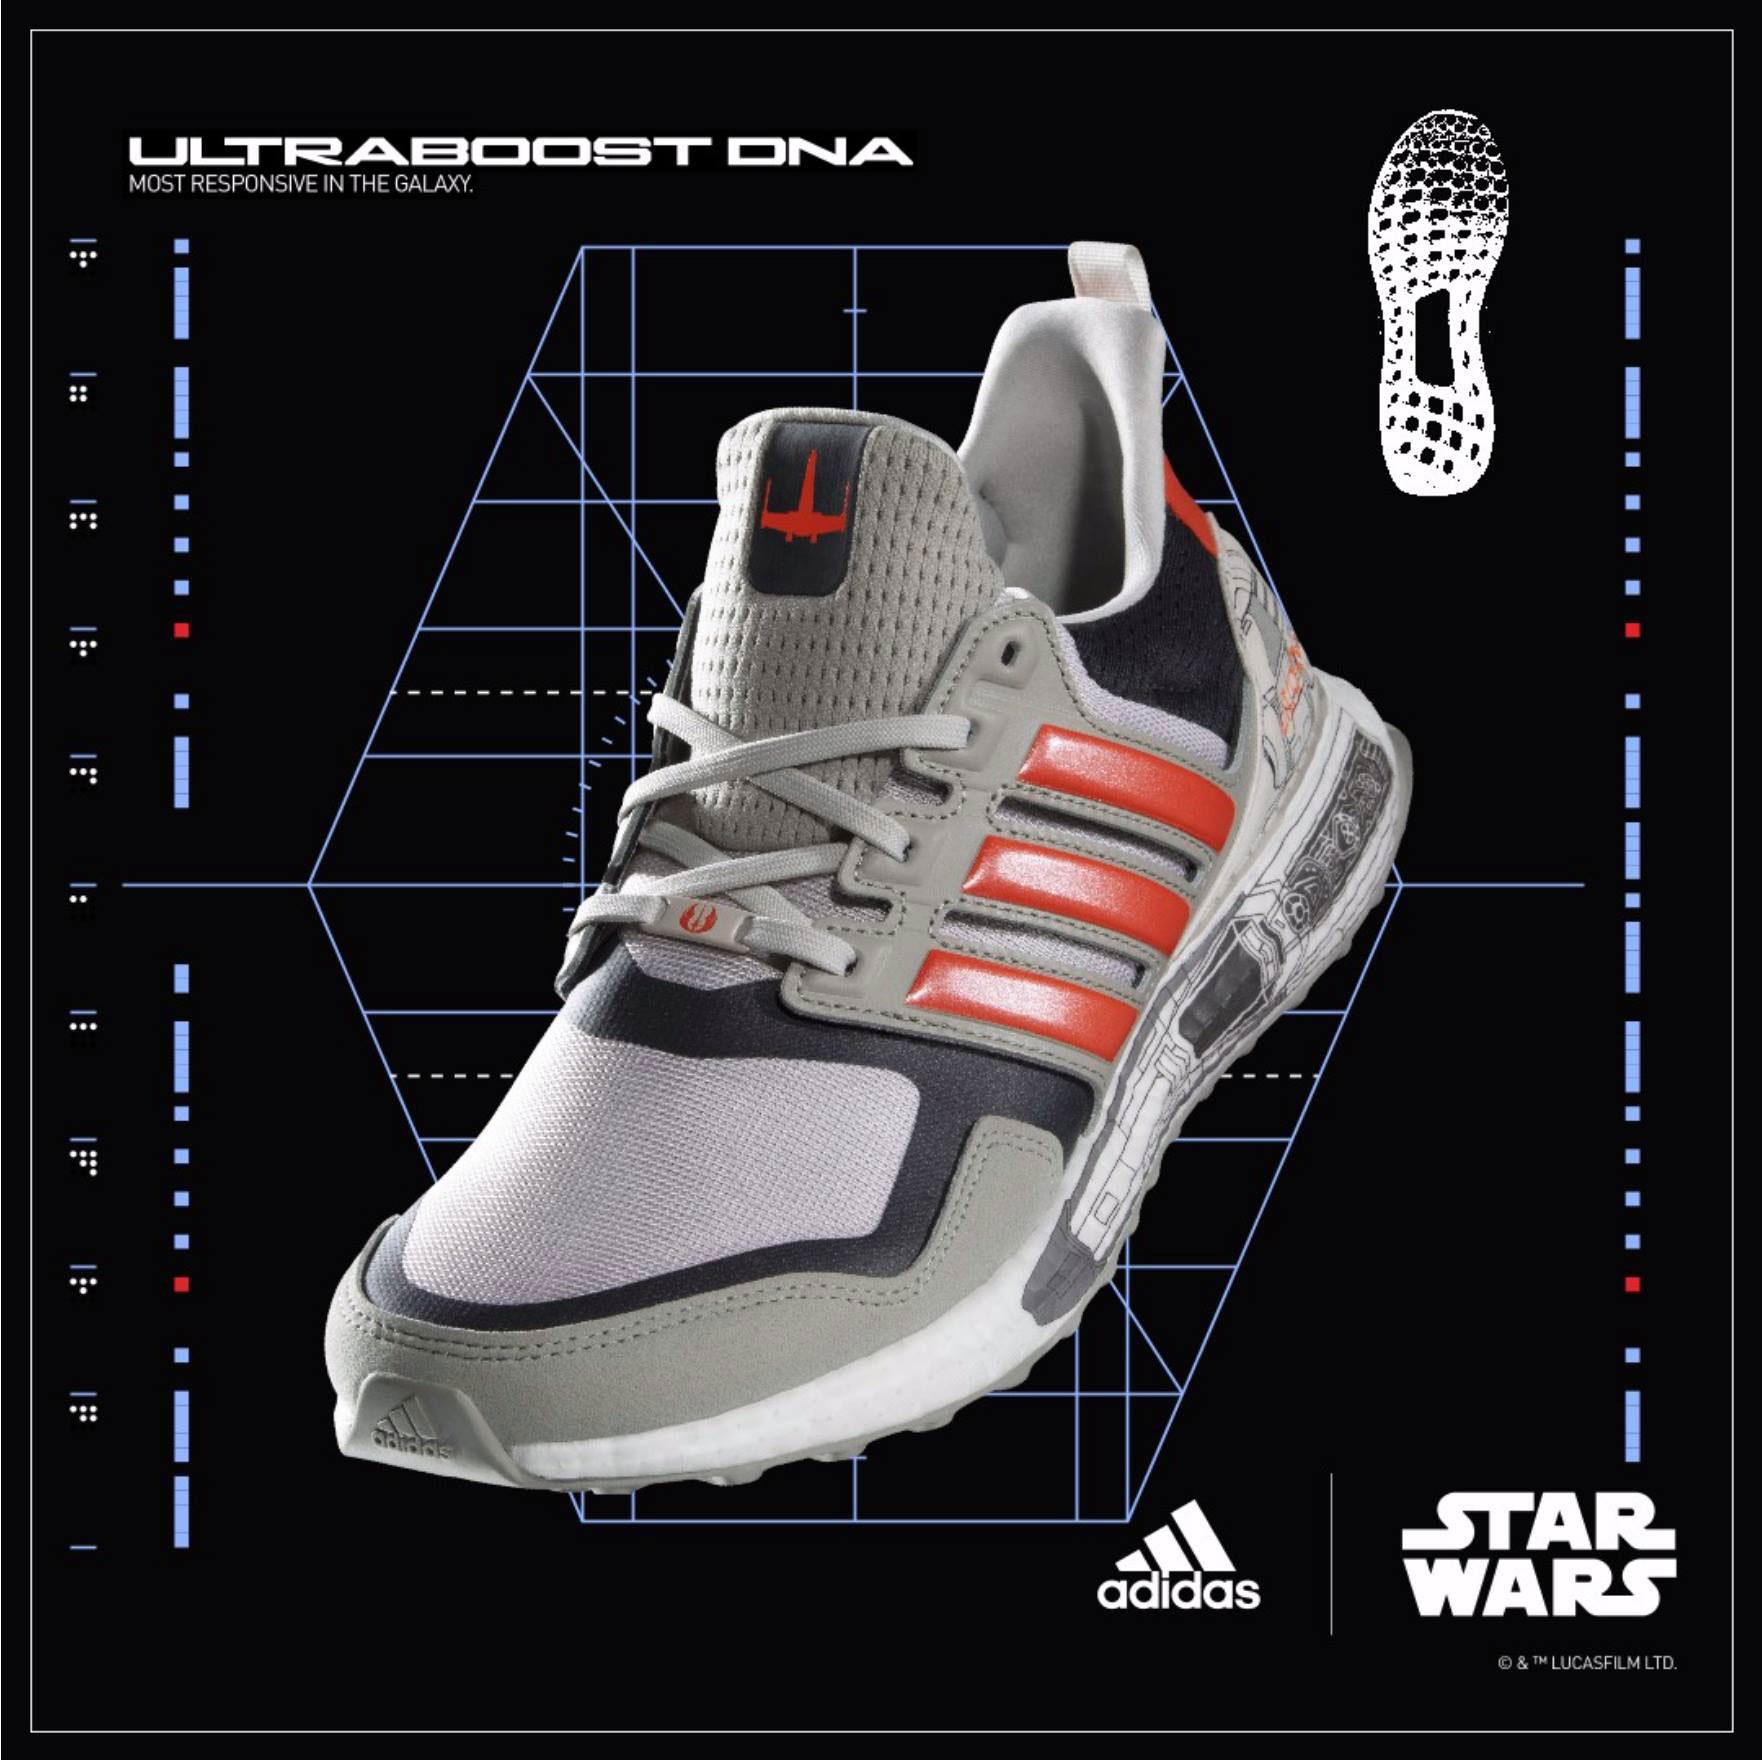 star-wars-adidas-ultraboost-x-wing-starfighter